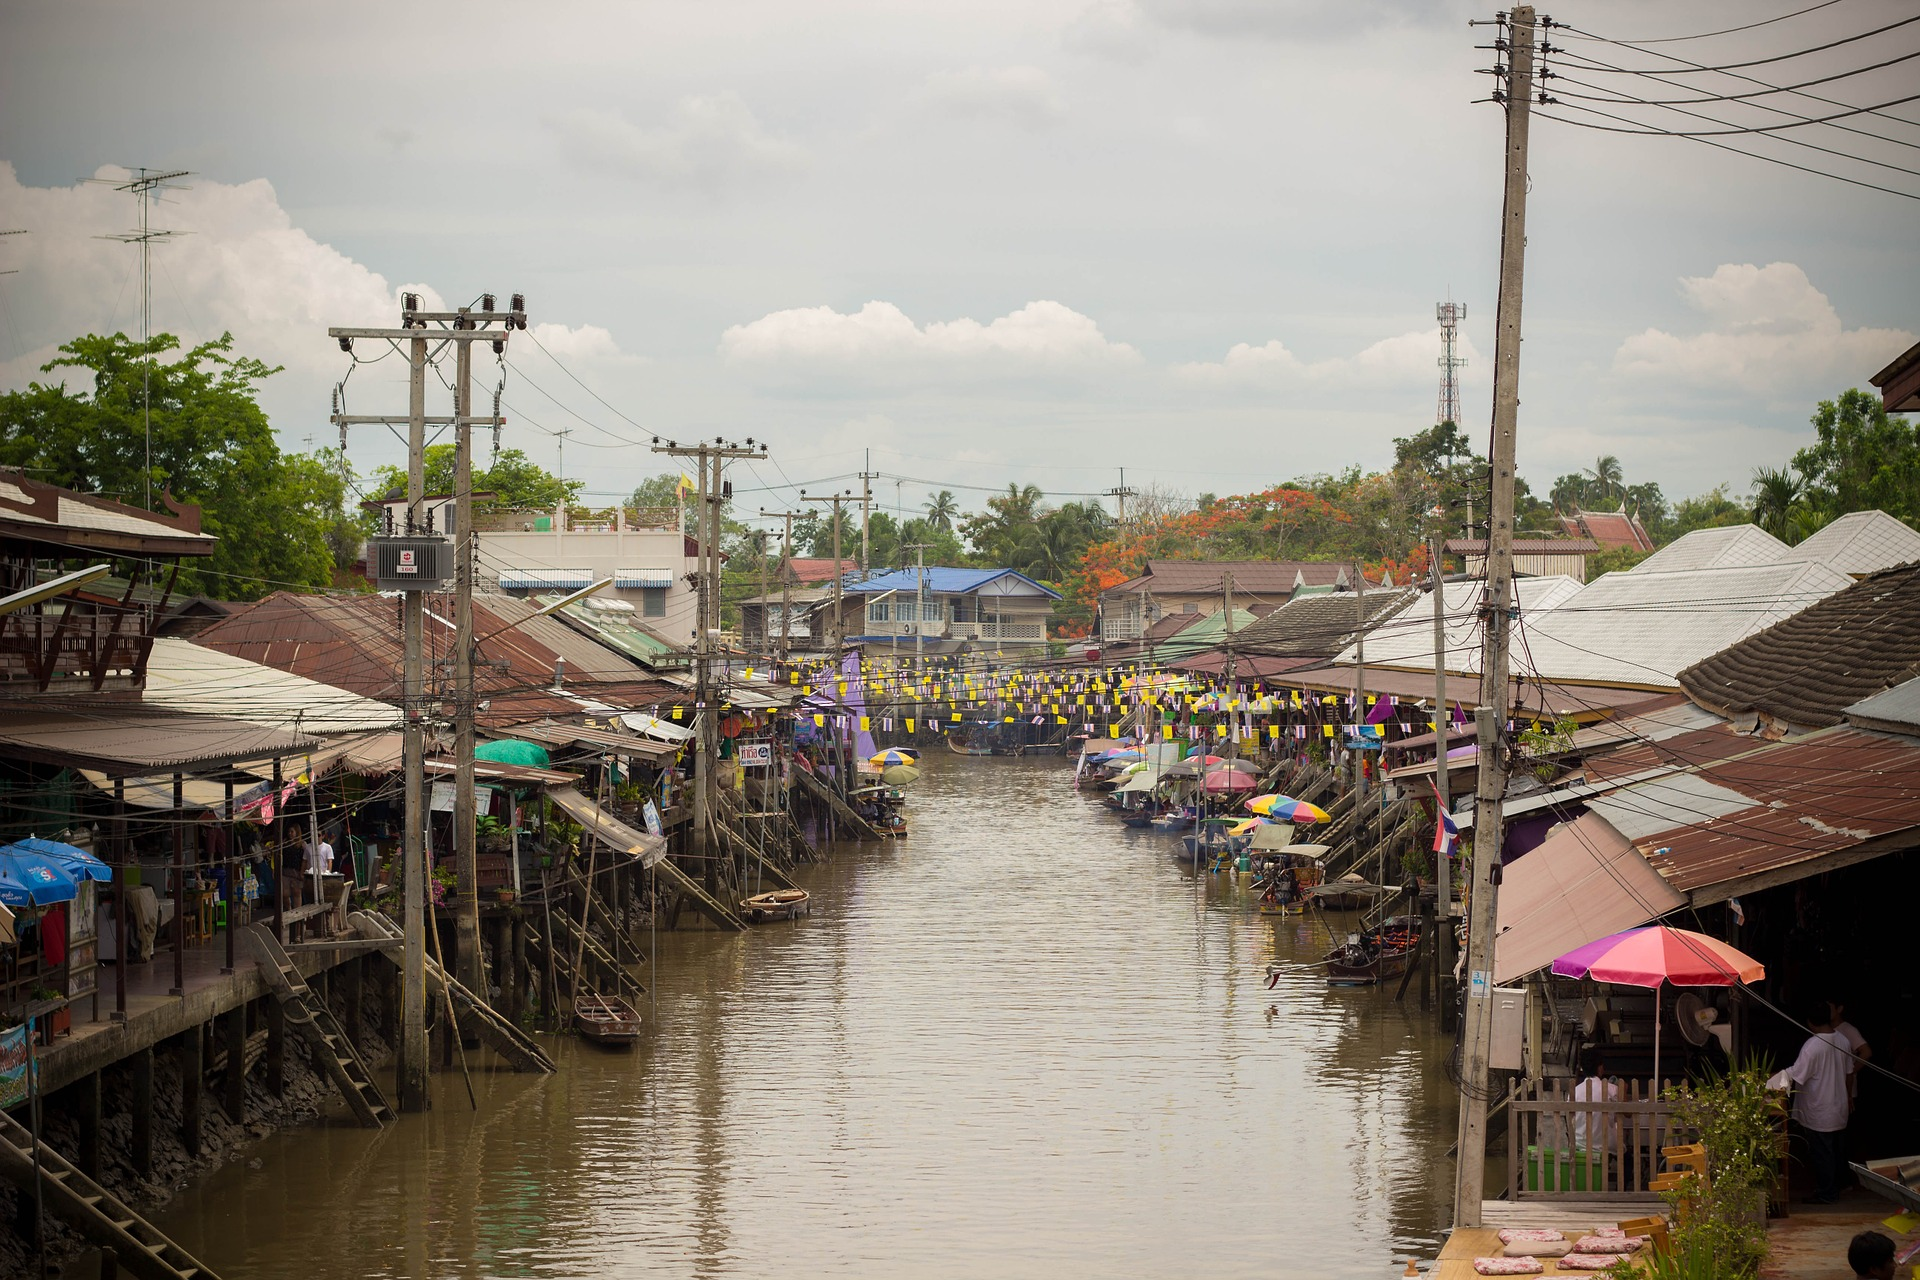 floating-market-650467_1920 (1)